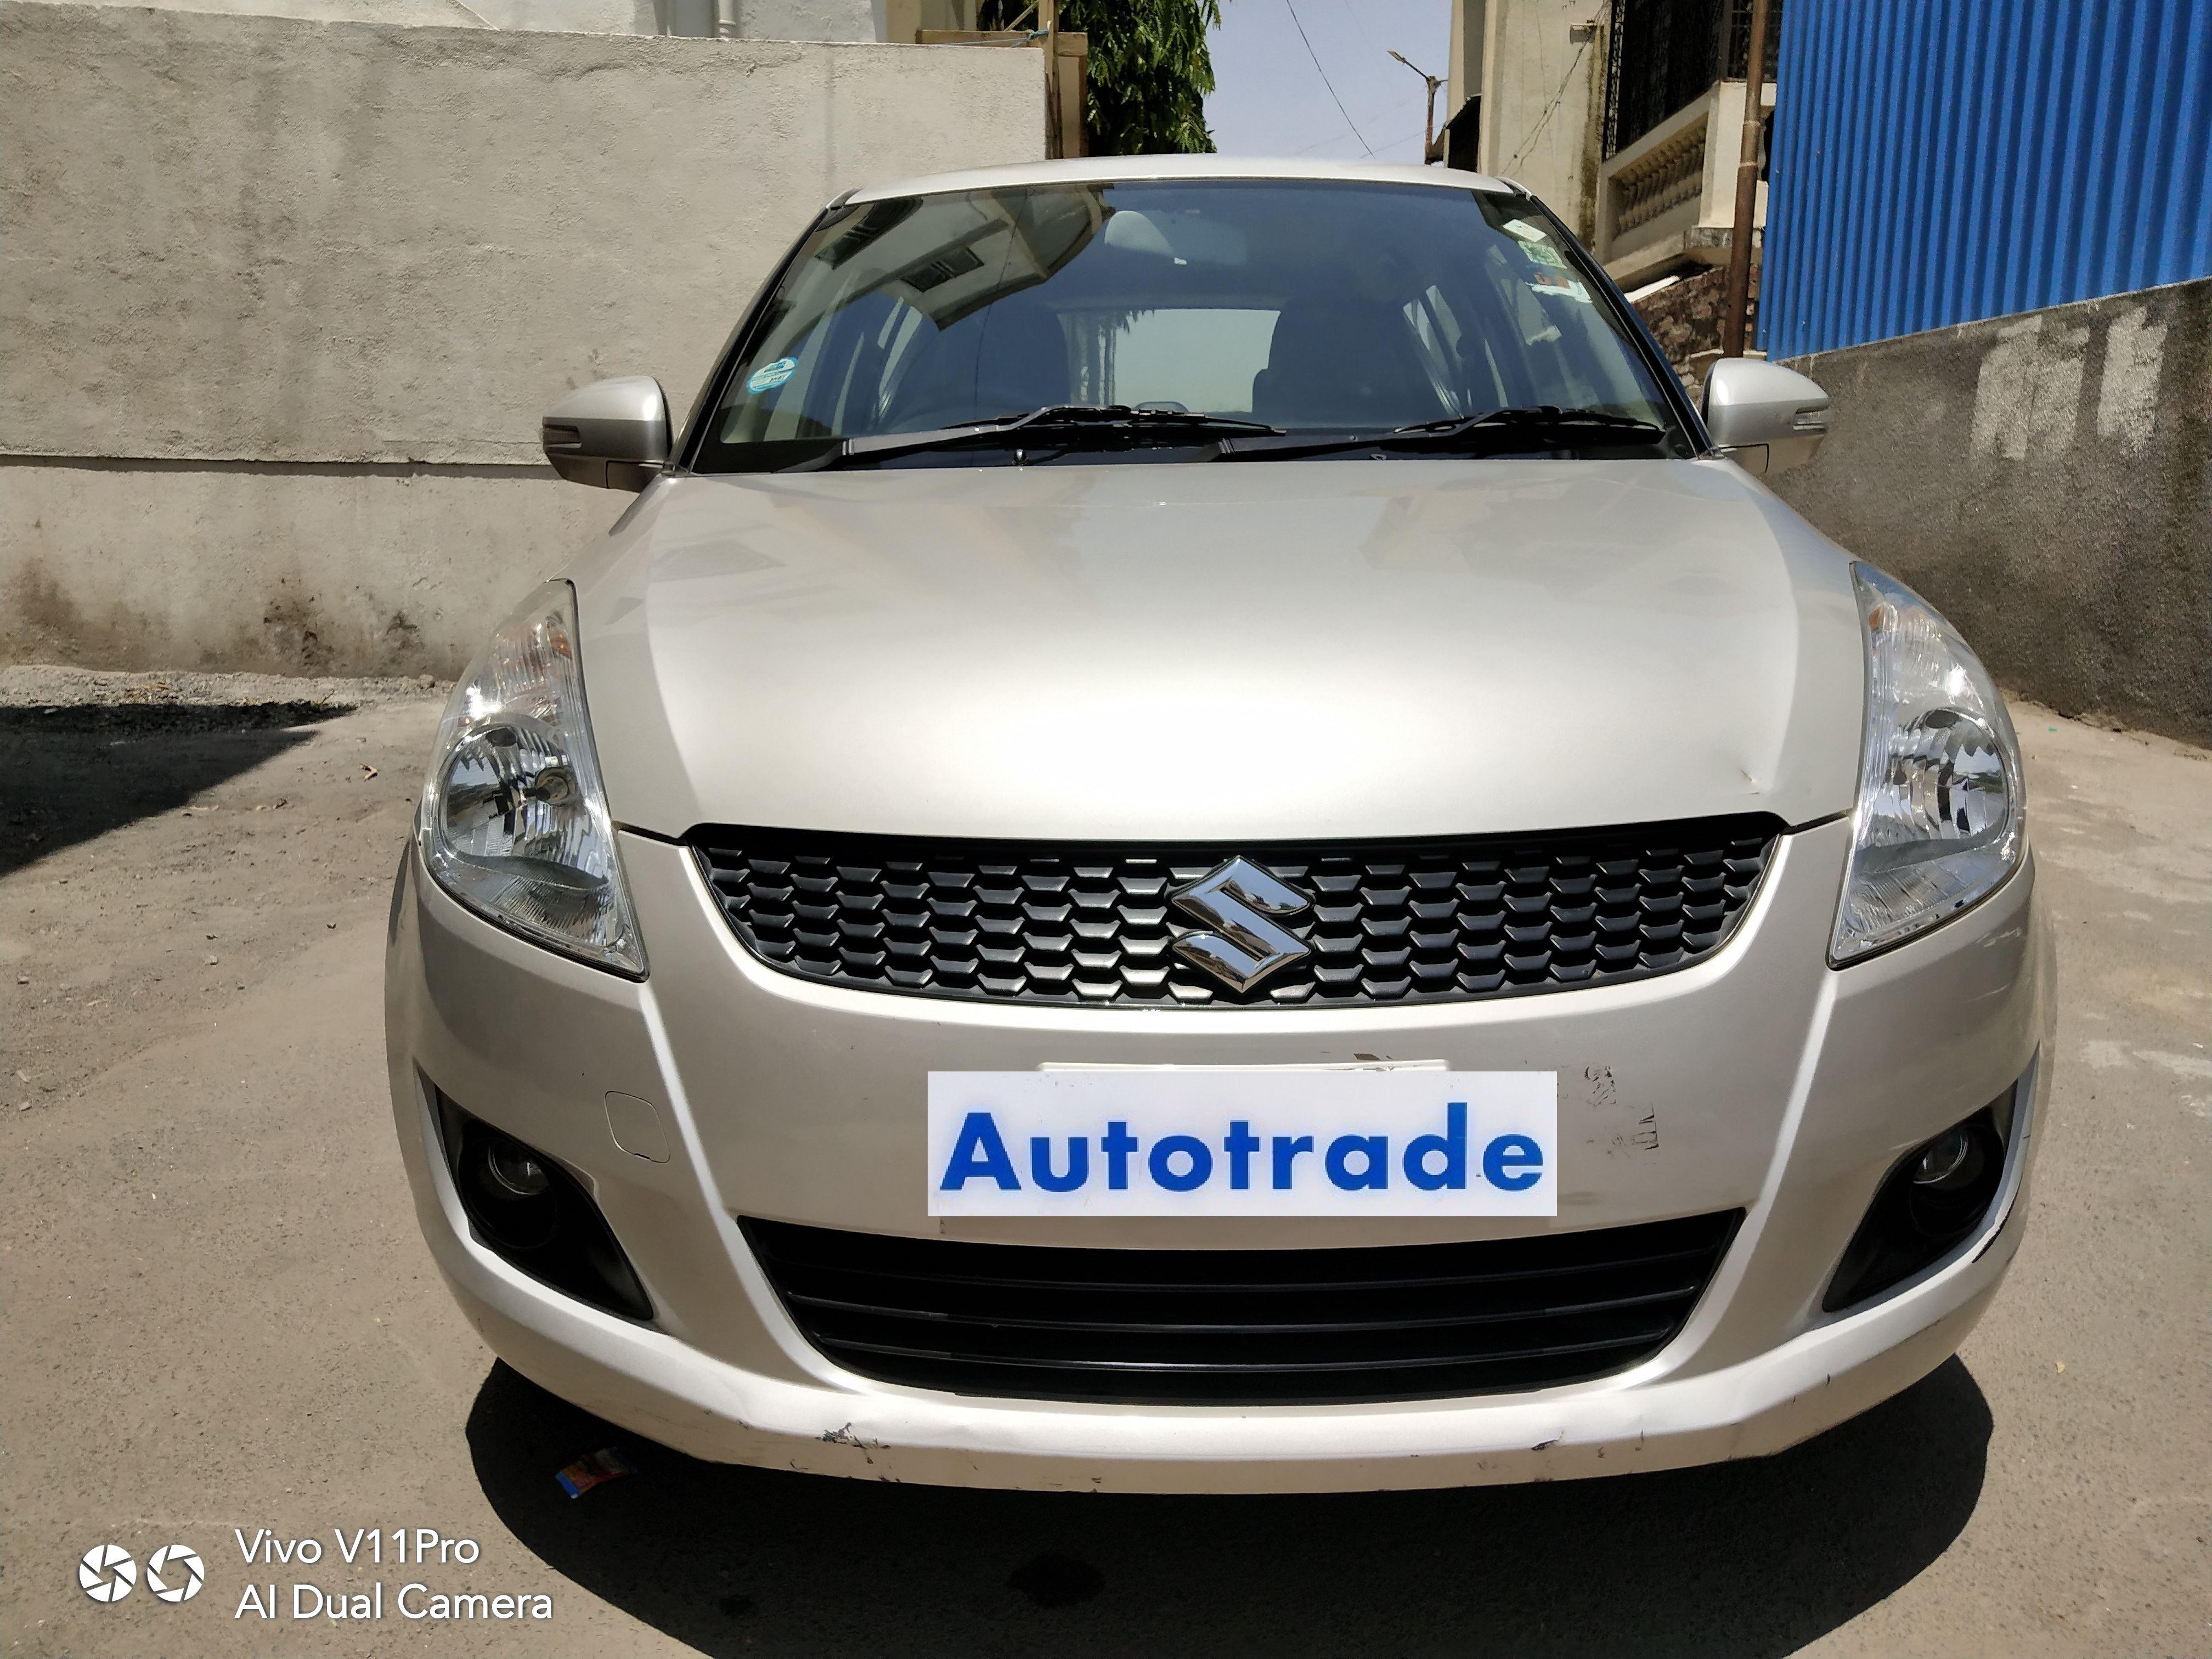 Used Maruti Suzuki Swift In Pune Used Cars In Pune Mahindra